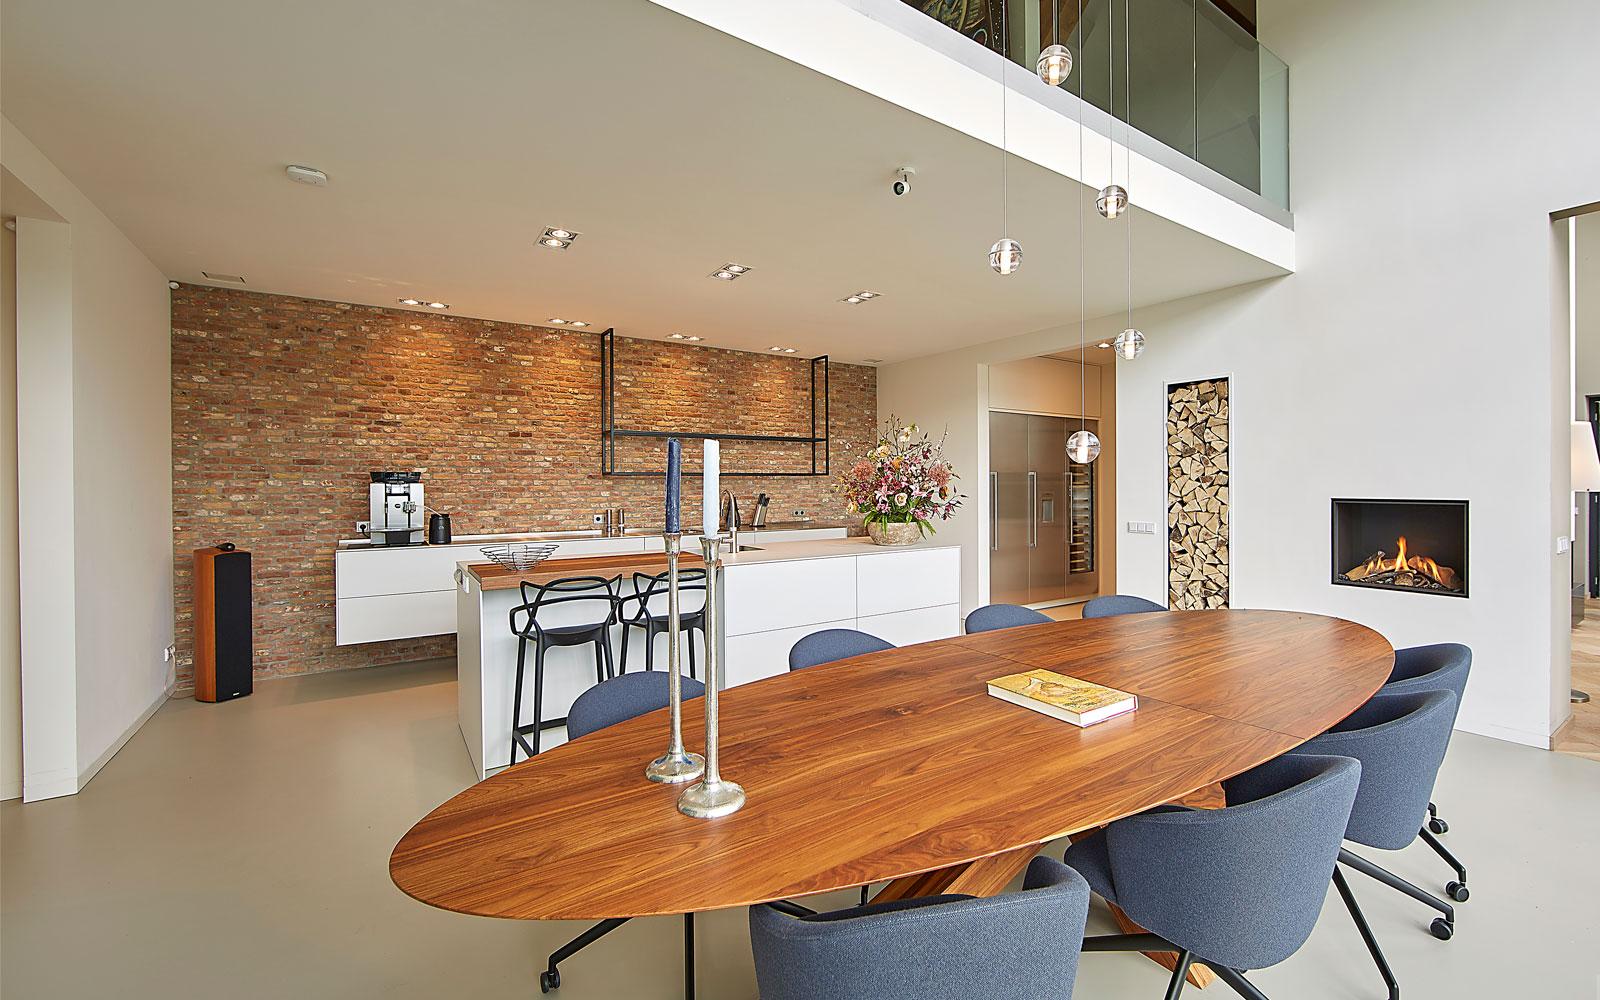 Diane interieurontwerp, luxe boerderij, modern, strak